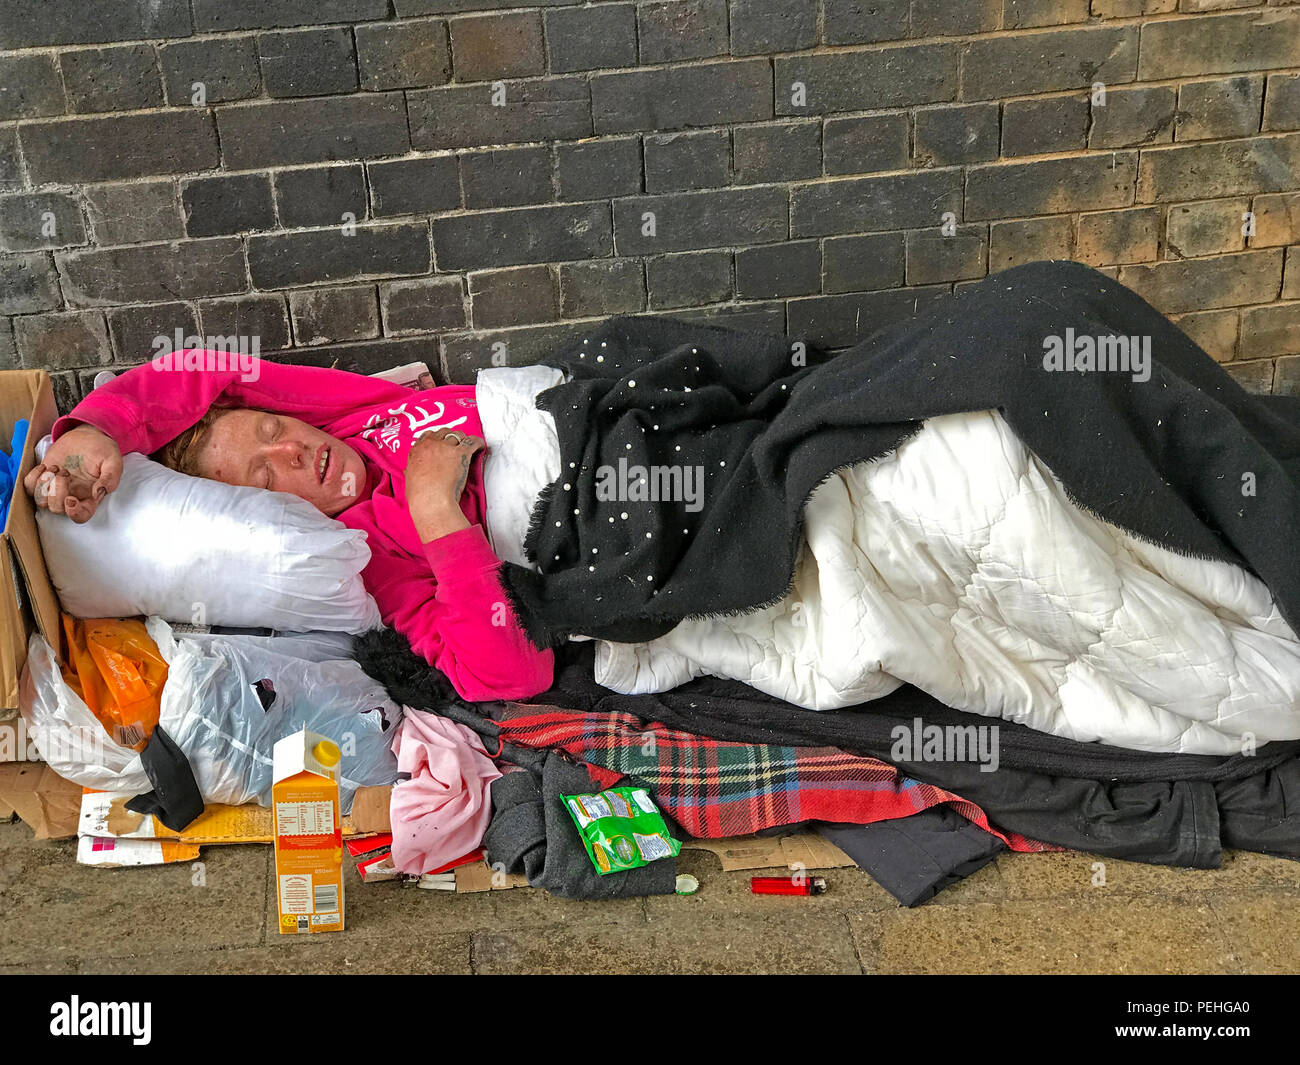 HotpixUK,GoTonySmith,Homelessness,homeless,without